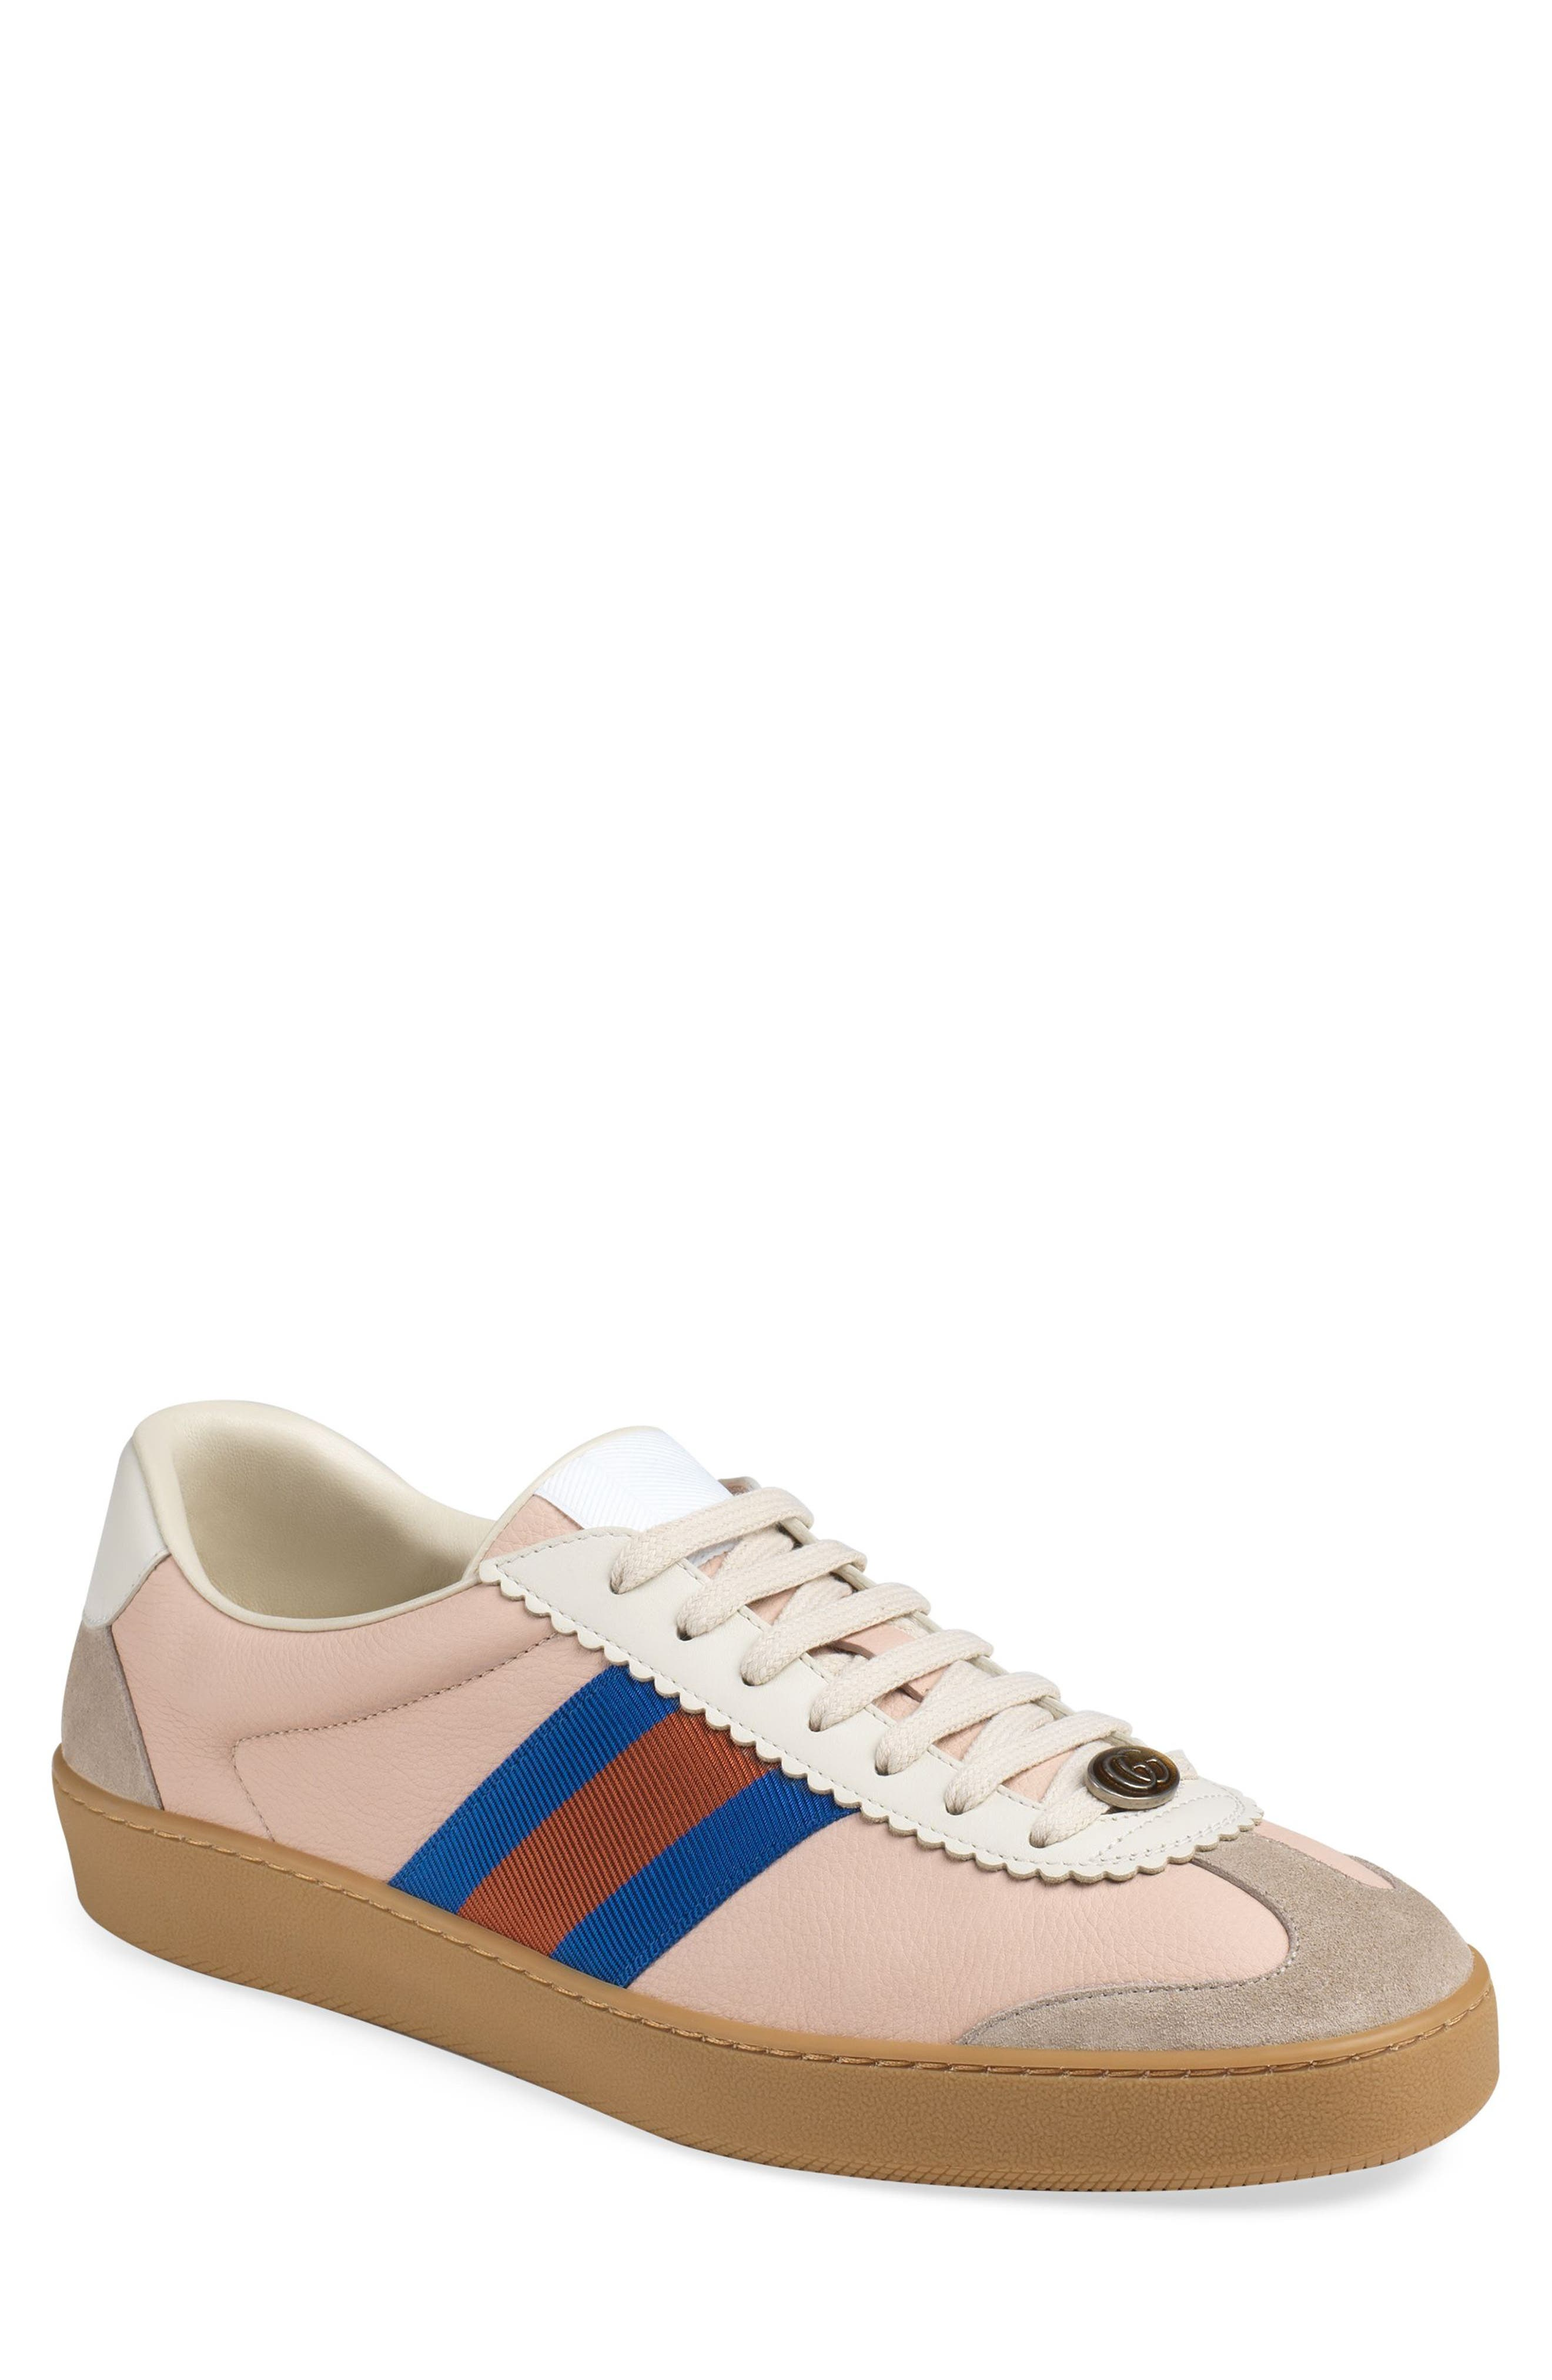 JBP Retro Gum Sole Sneaker,                             Main thumbnail 1, color,                             Oatmeal/ White